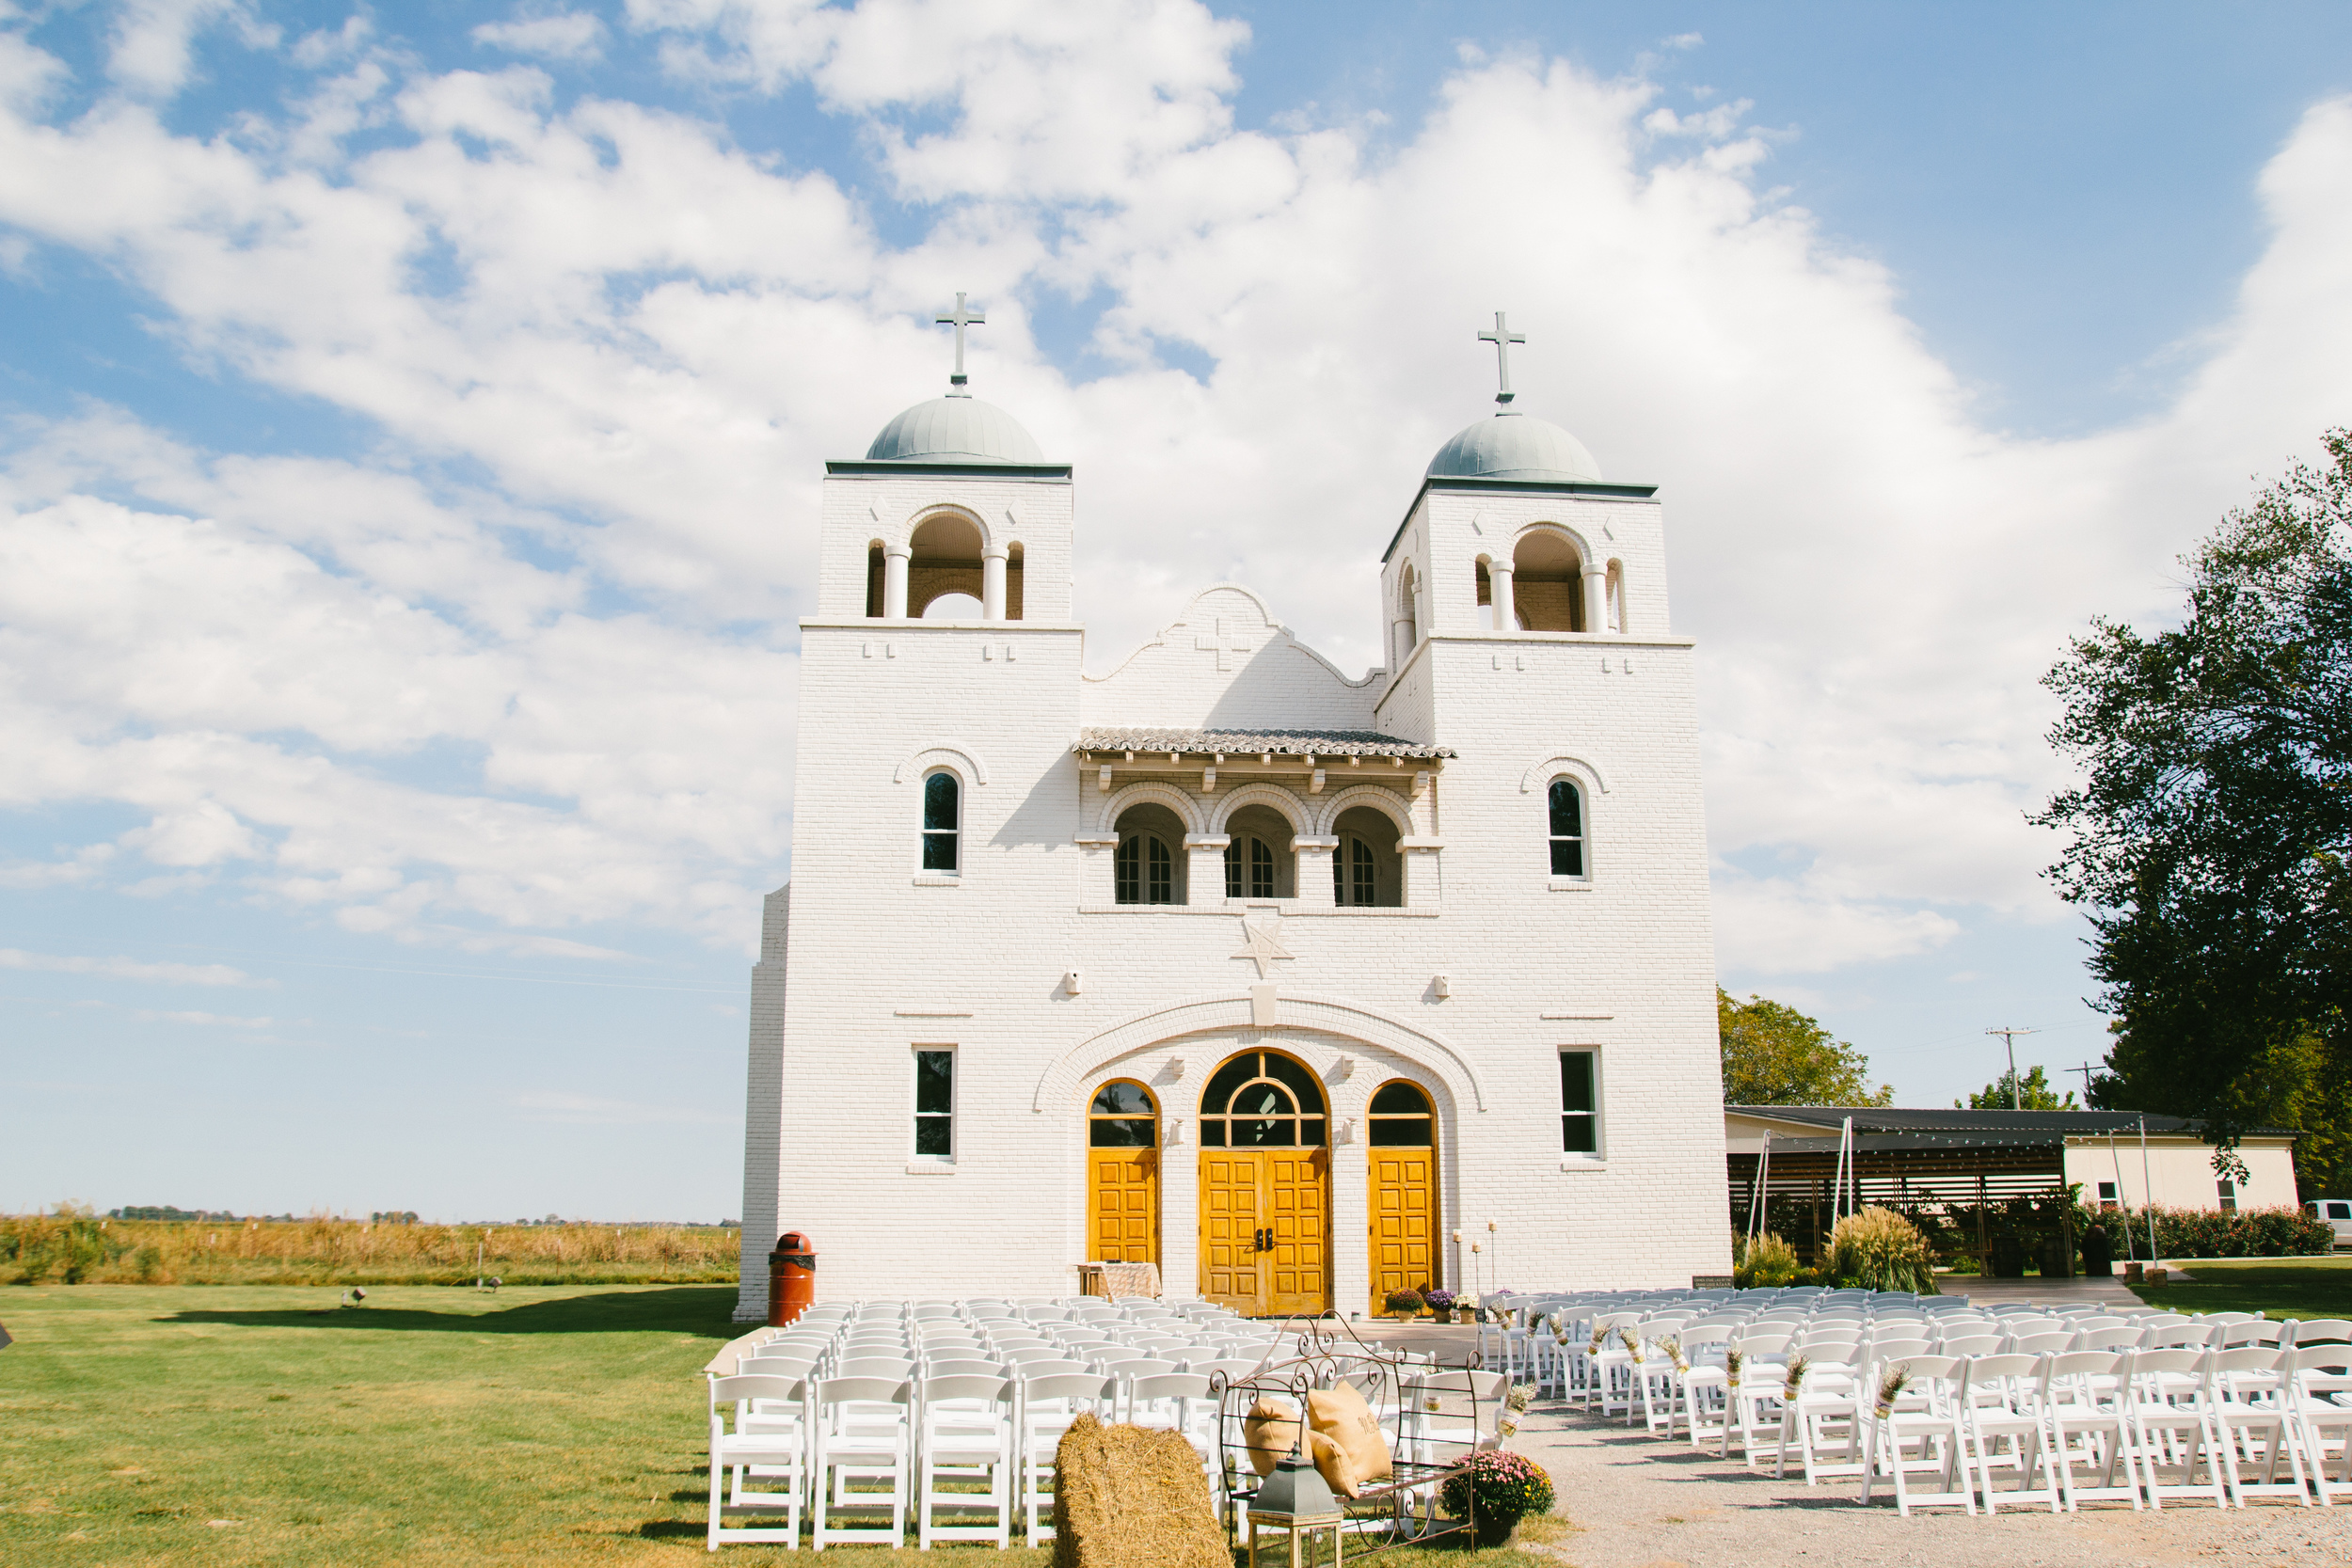 From Britt's Eye View (The Bride List Vendor)